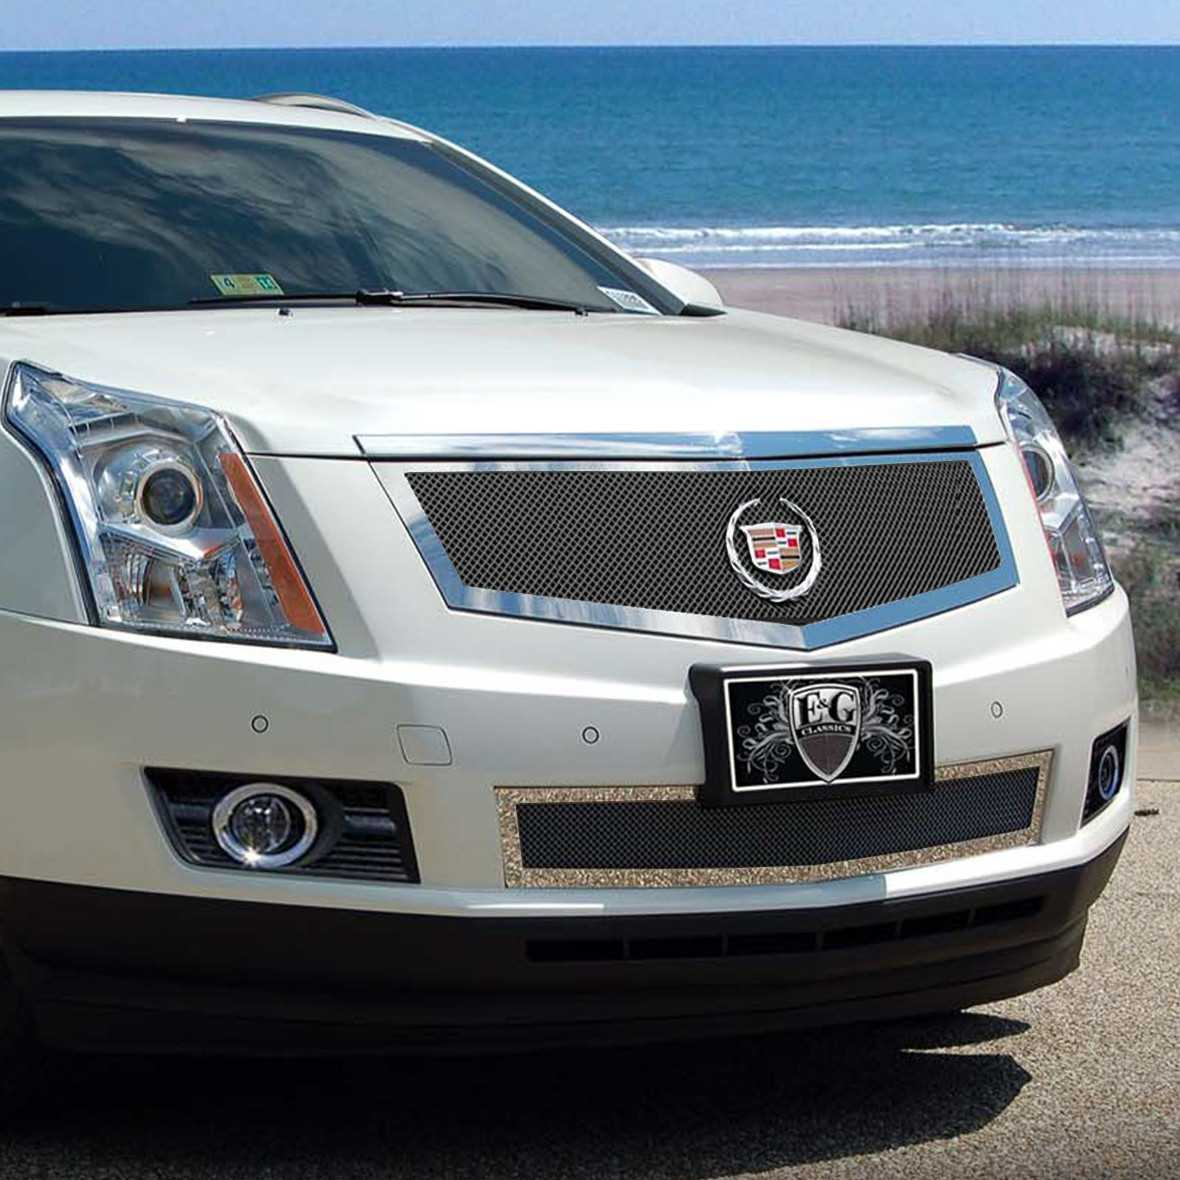 Cadillac Srx: E&G Classics 2010-2012 Cadillac SRX Grille 2 Pc Fine Mesh